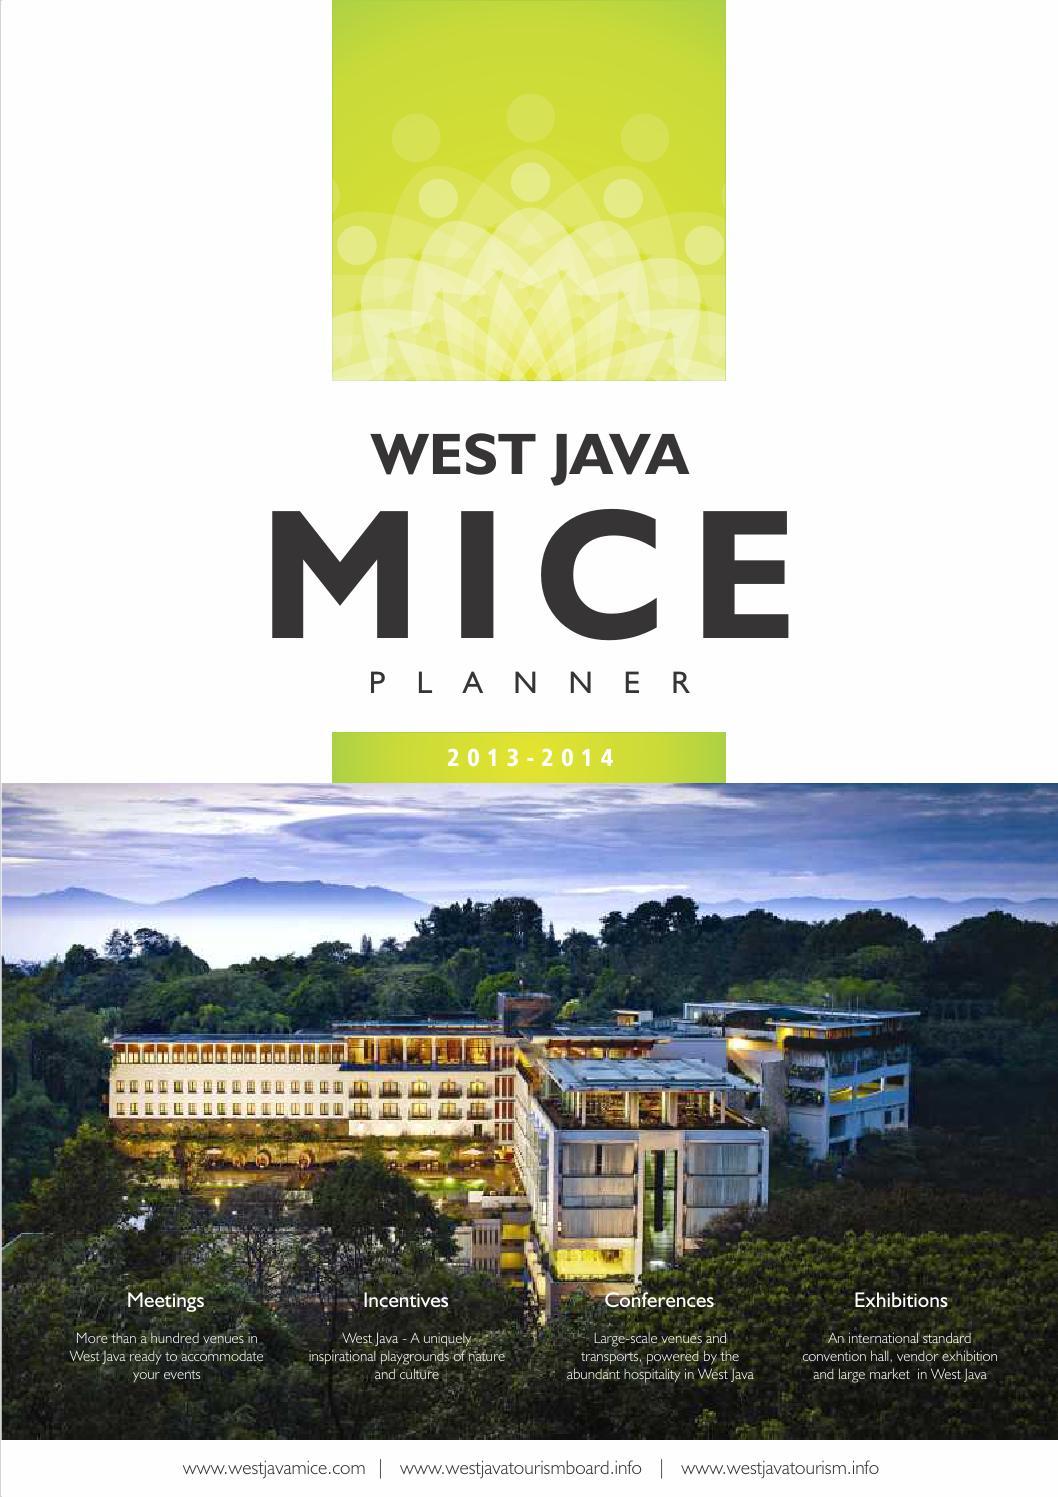 West Java Mice Planner 2013 2014